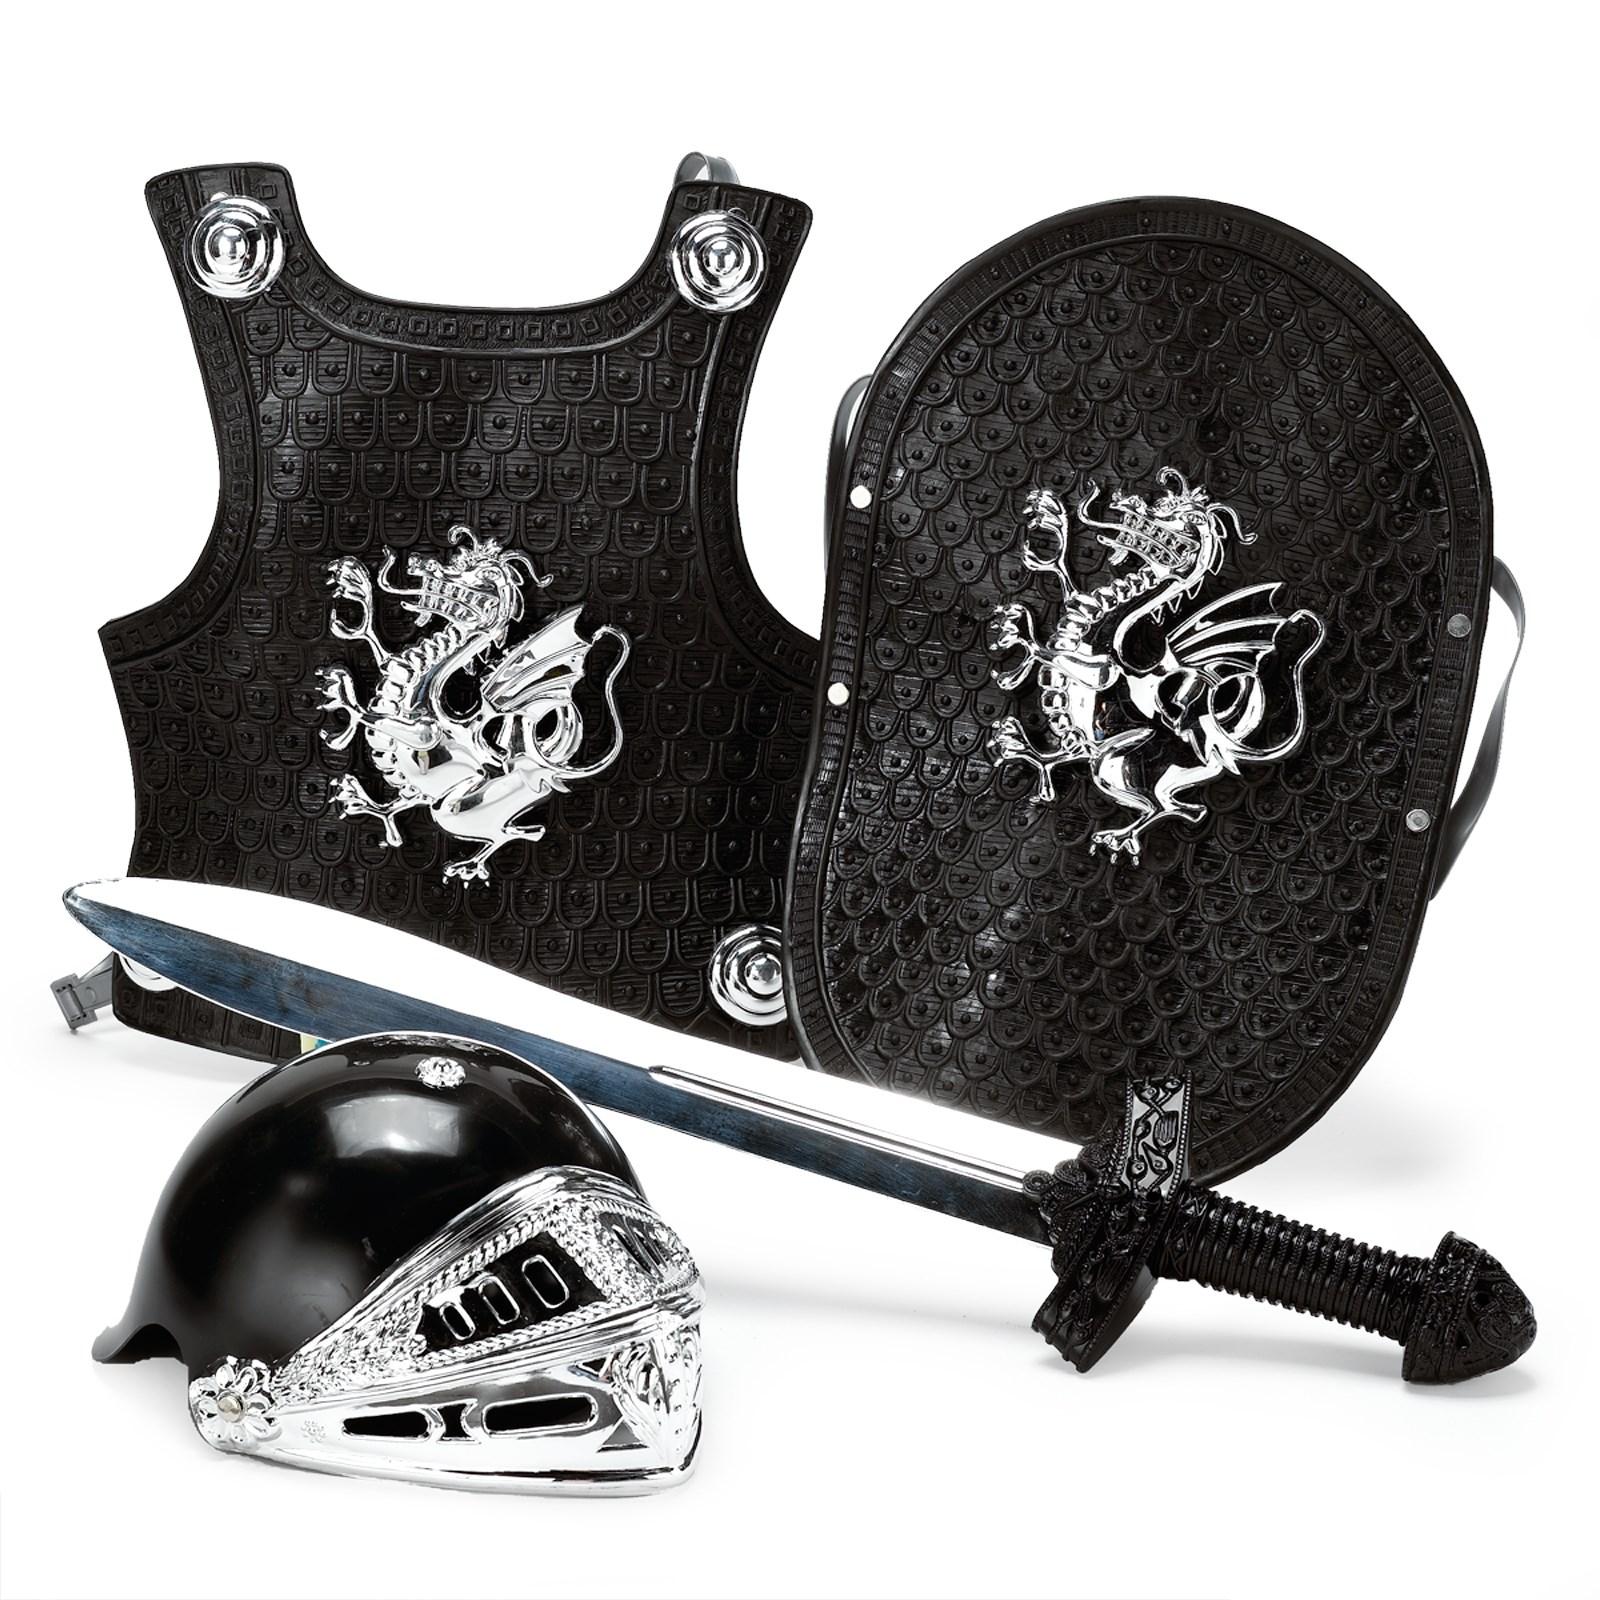 Image of Armor Set